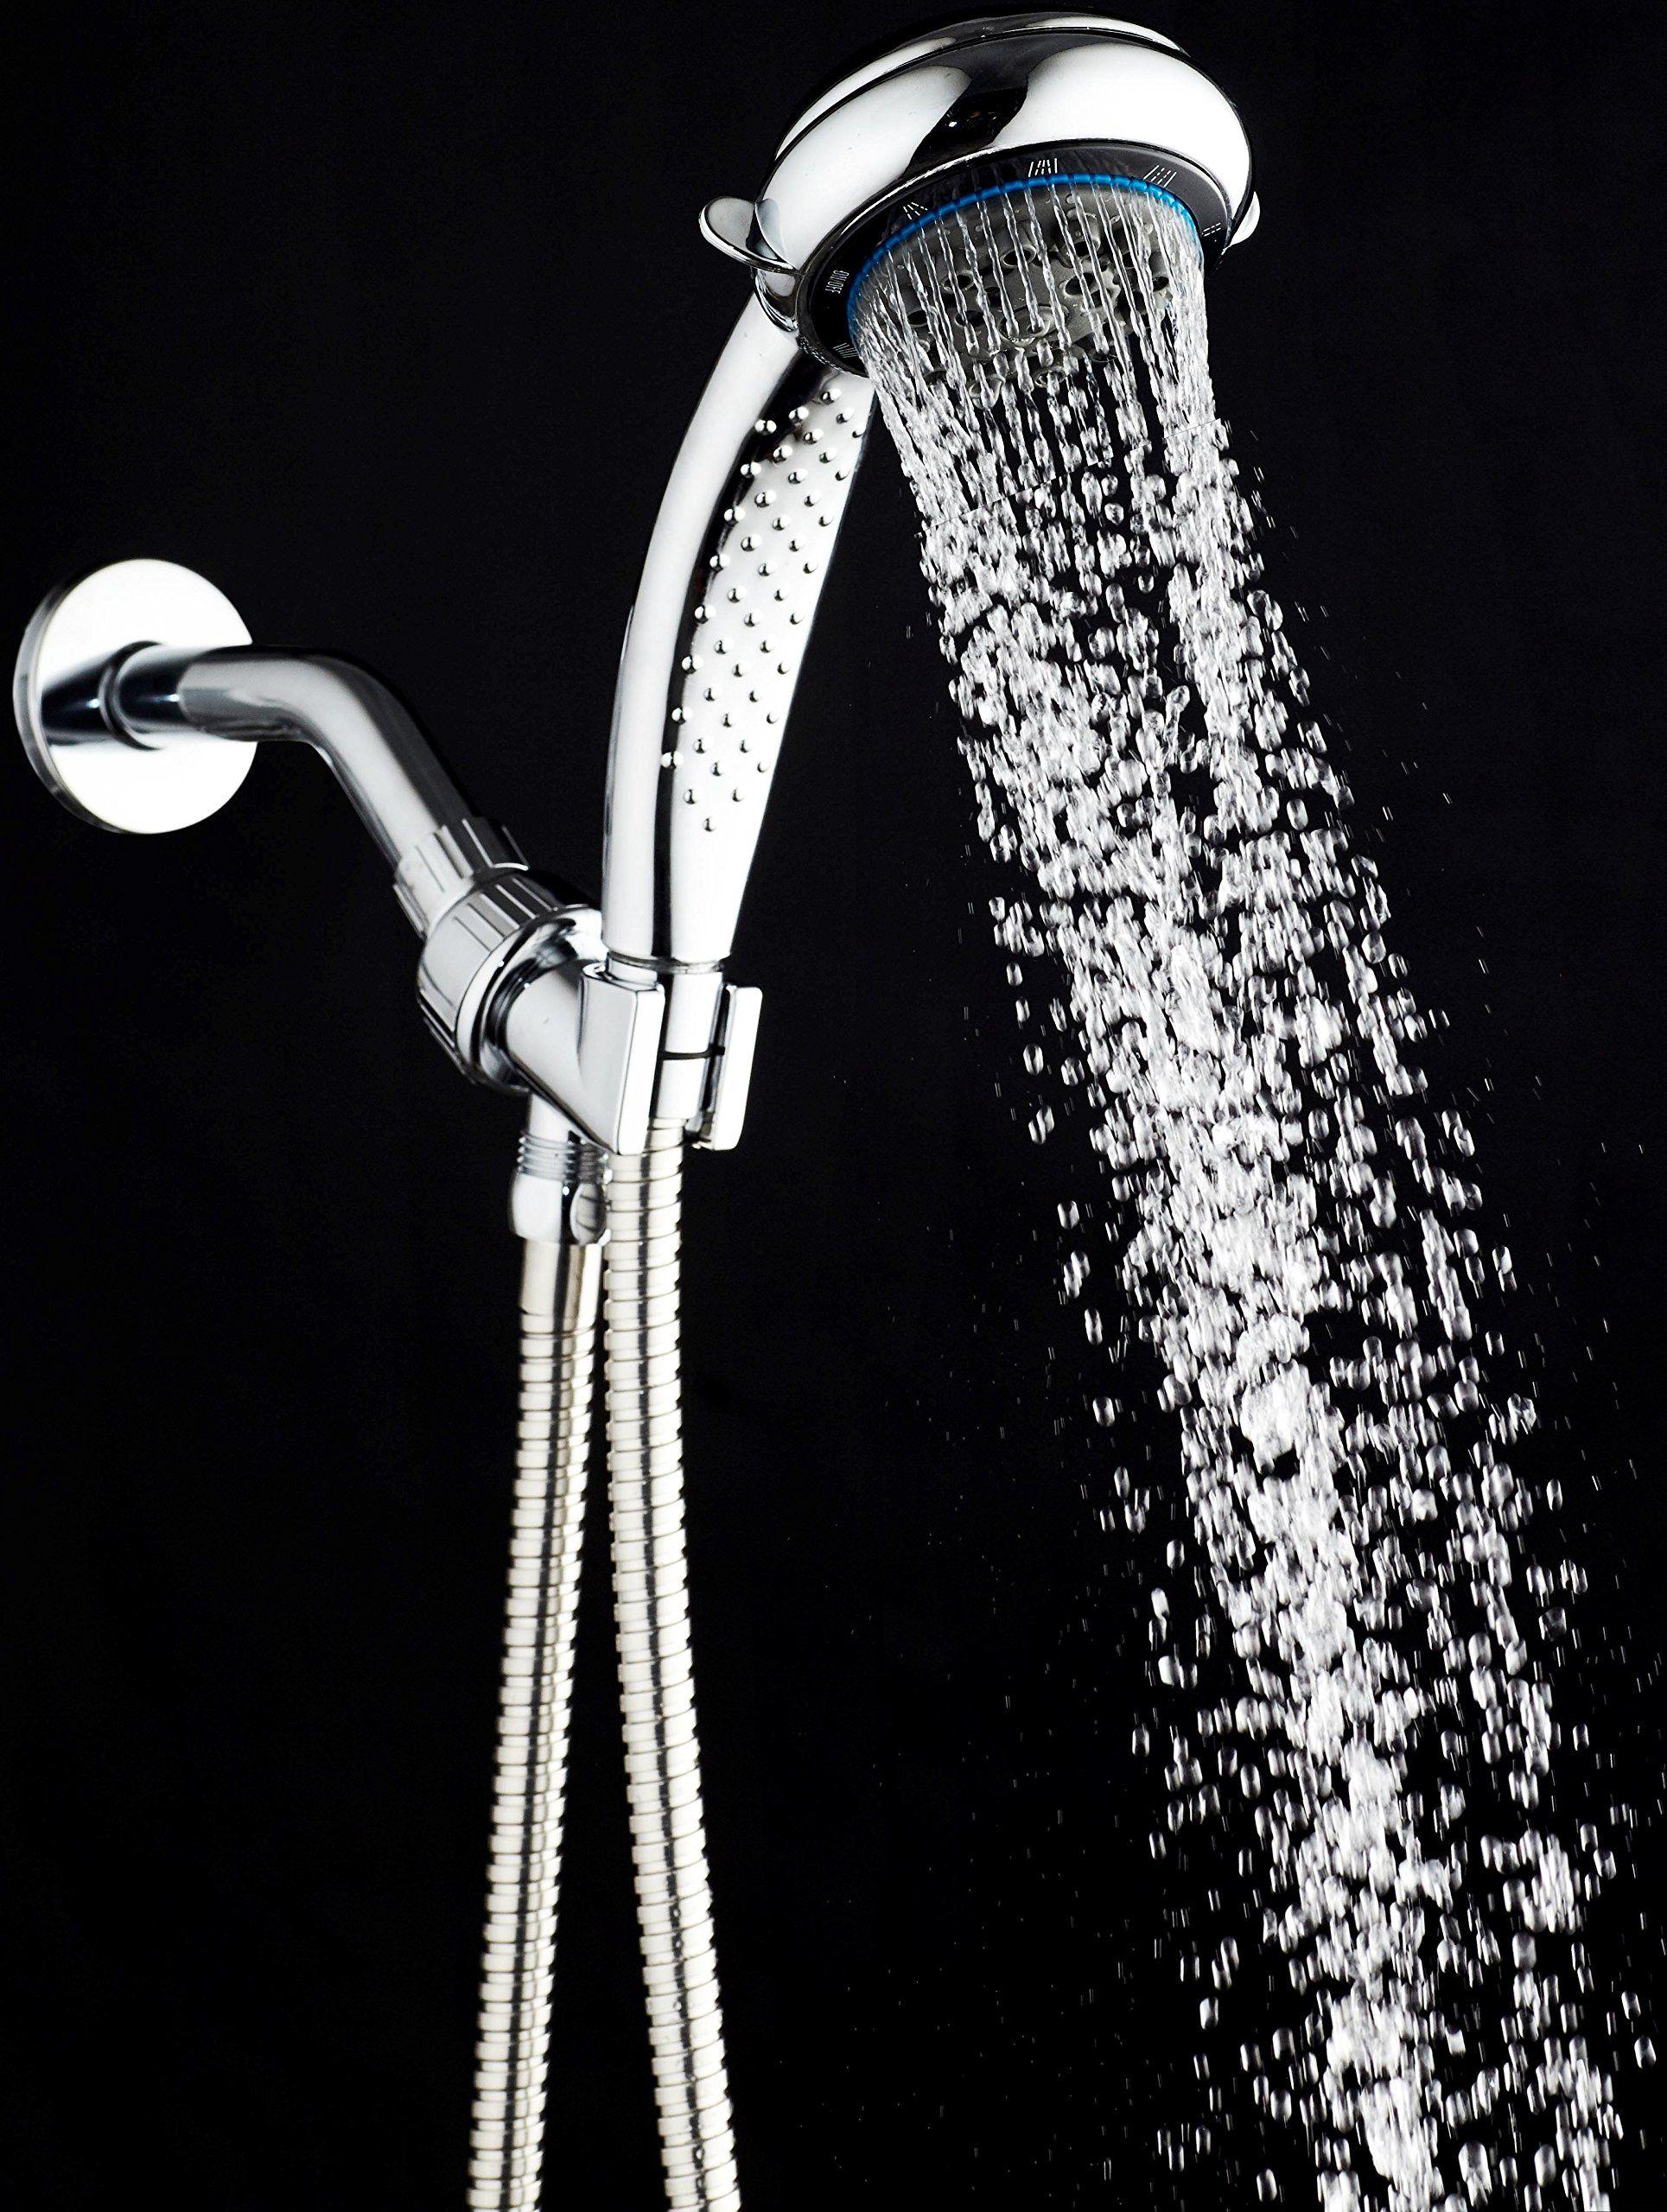 Handheld Shower Head with 8 Spray Settings, Chrome; Hose, Adjustable ...